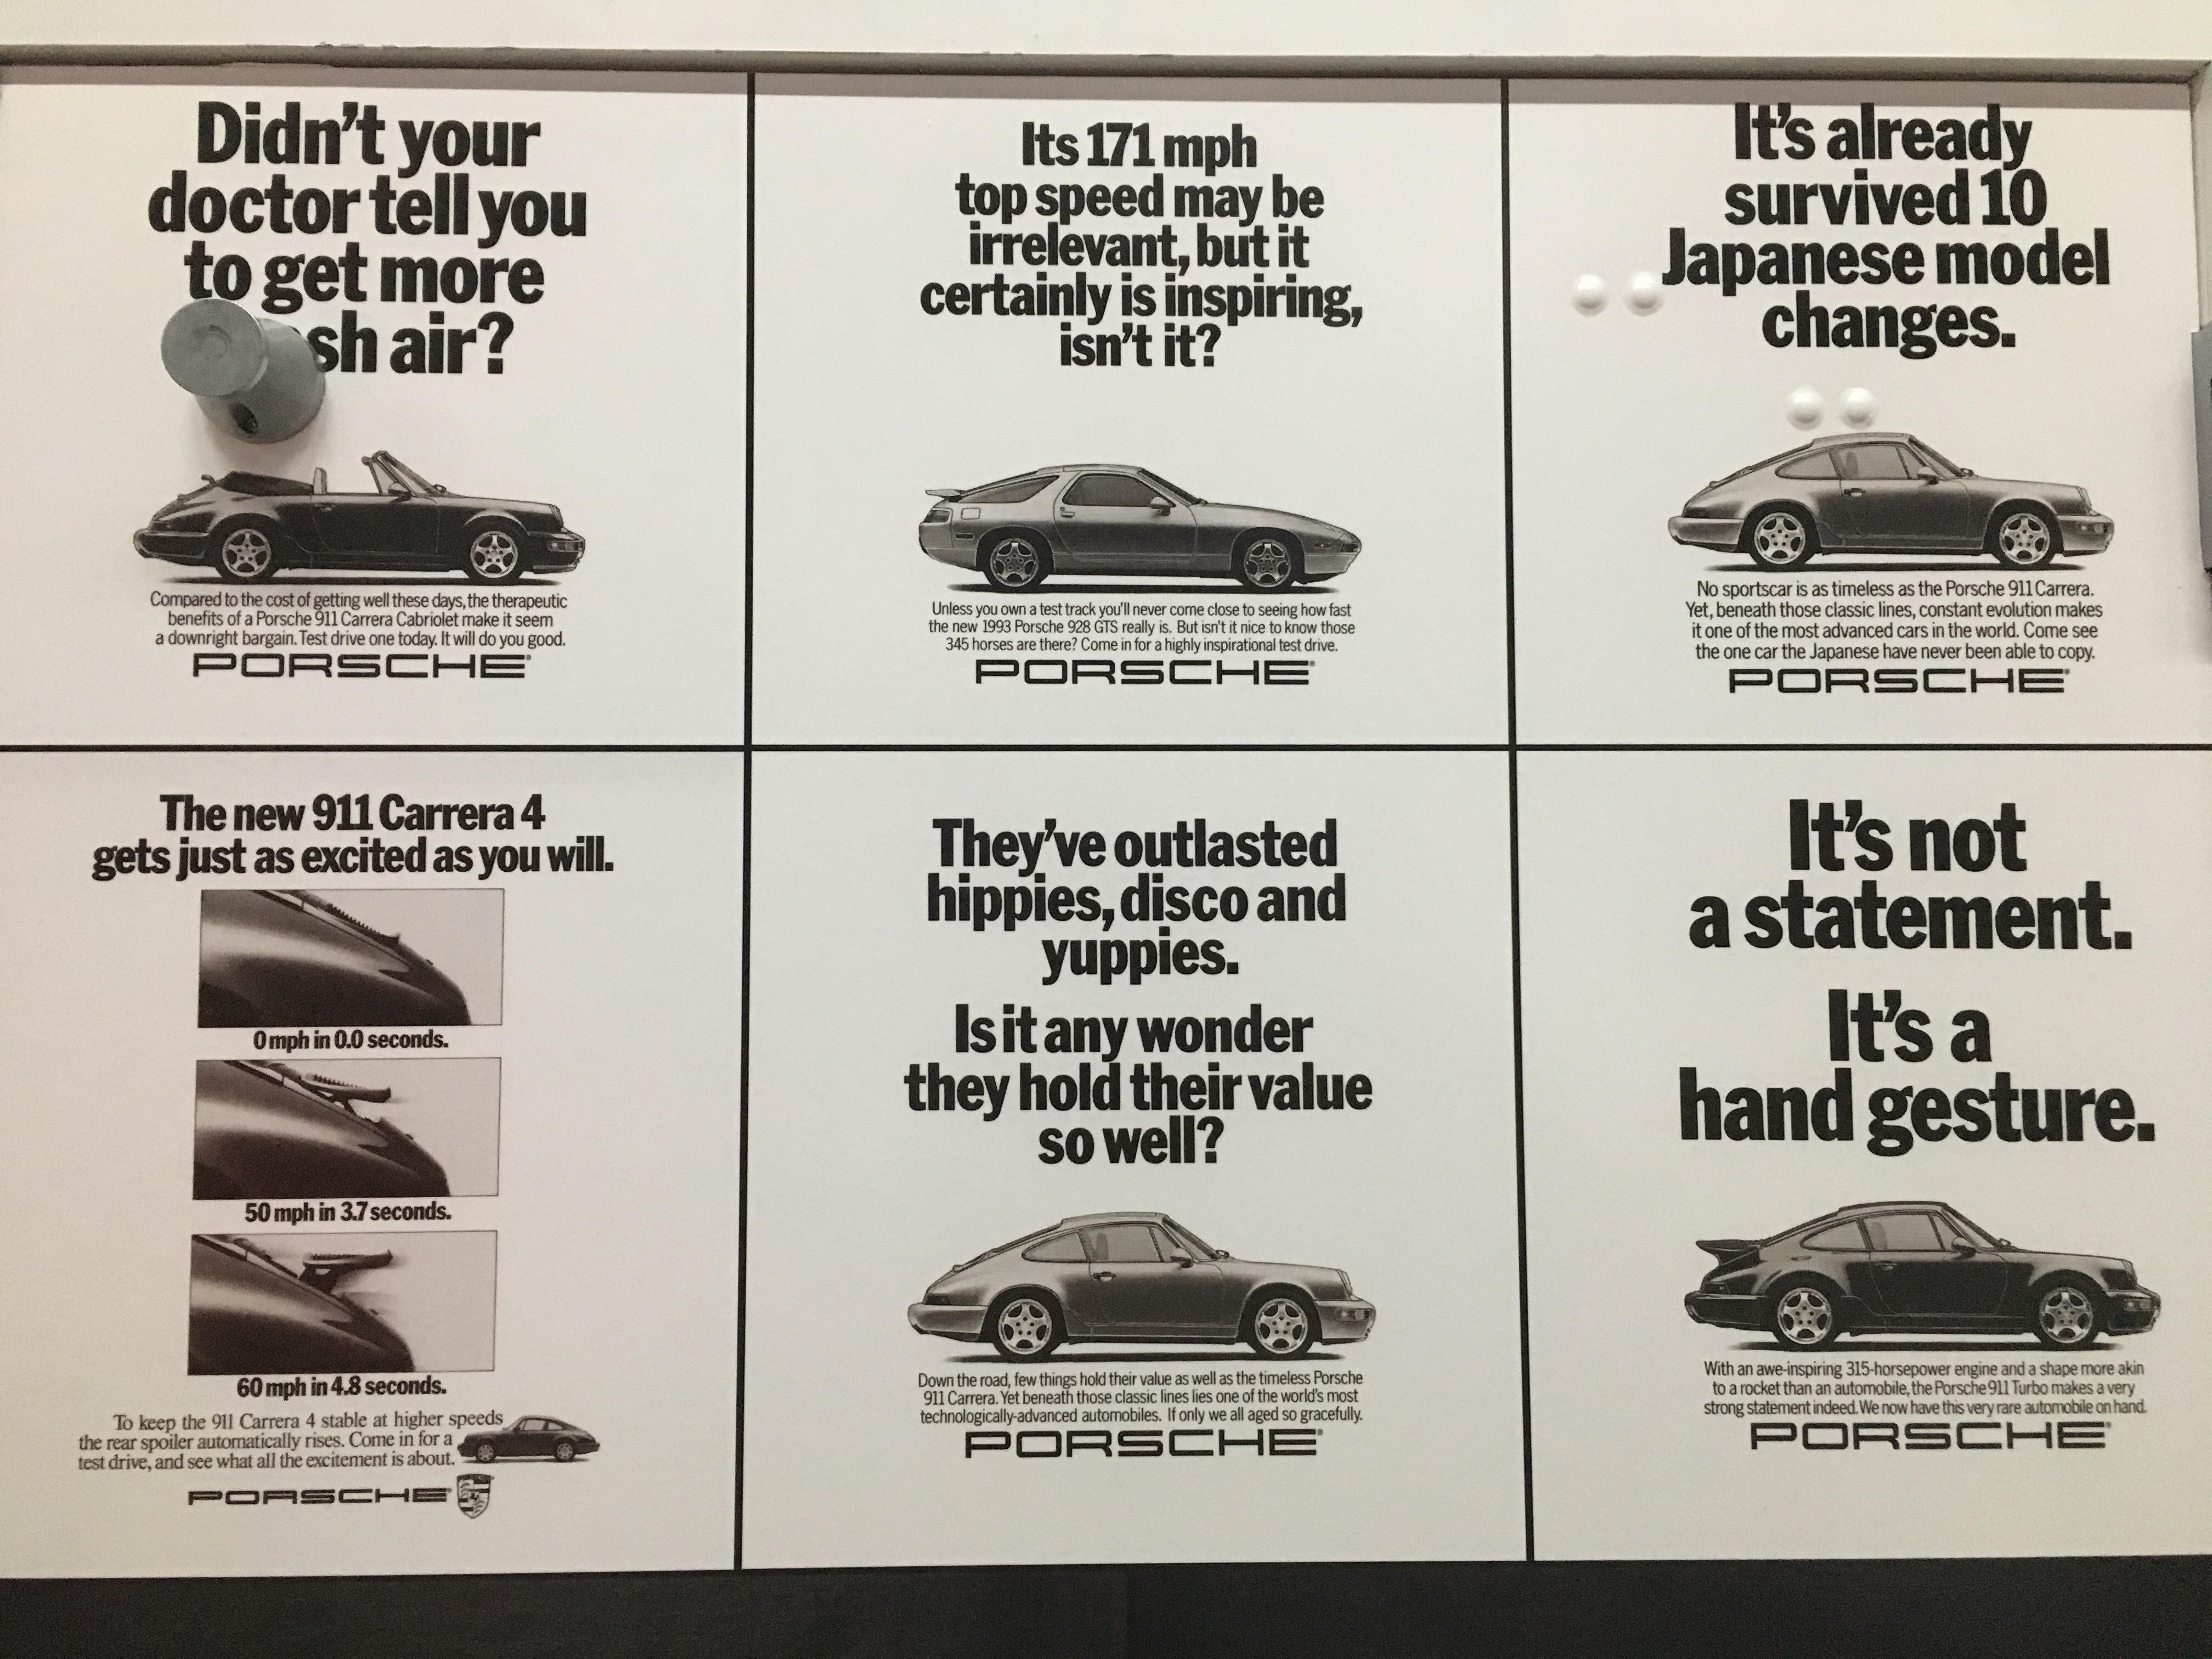 Funny Porsche advertisement